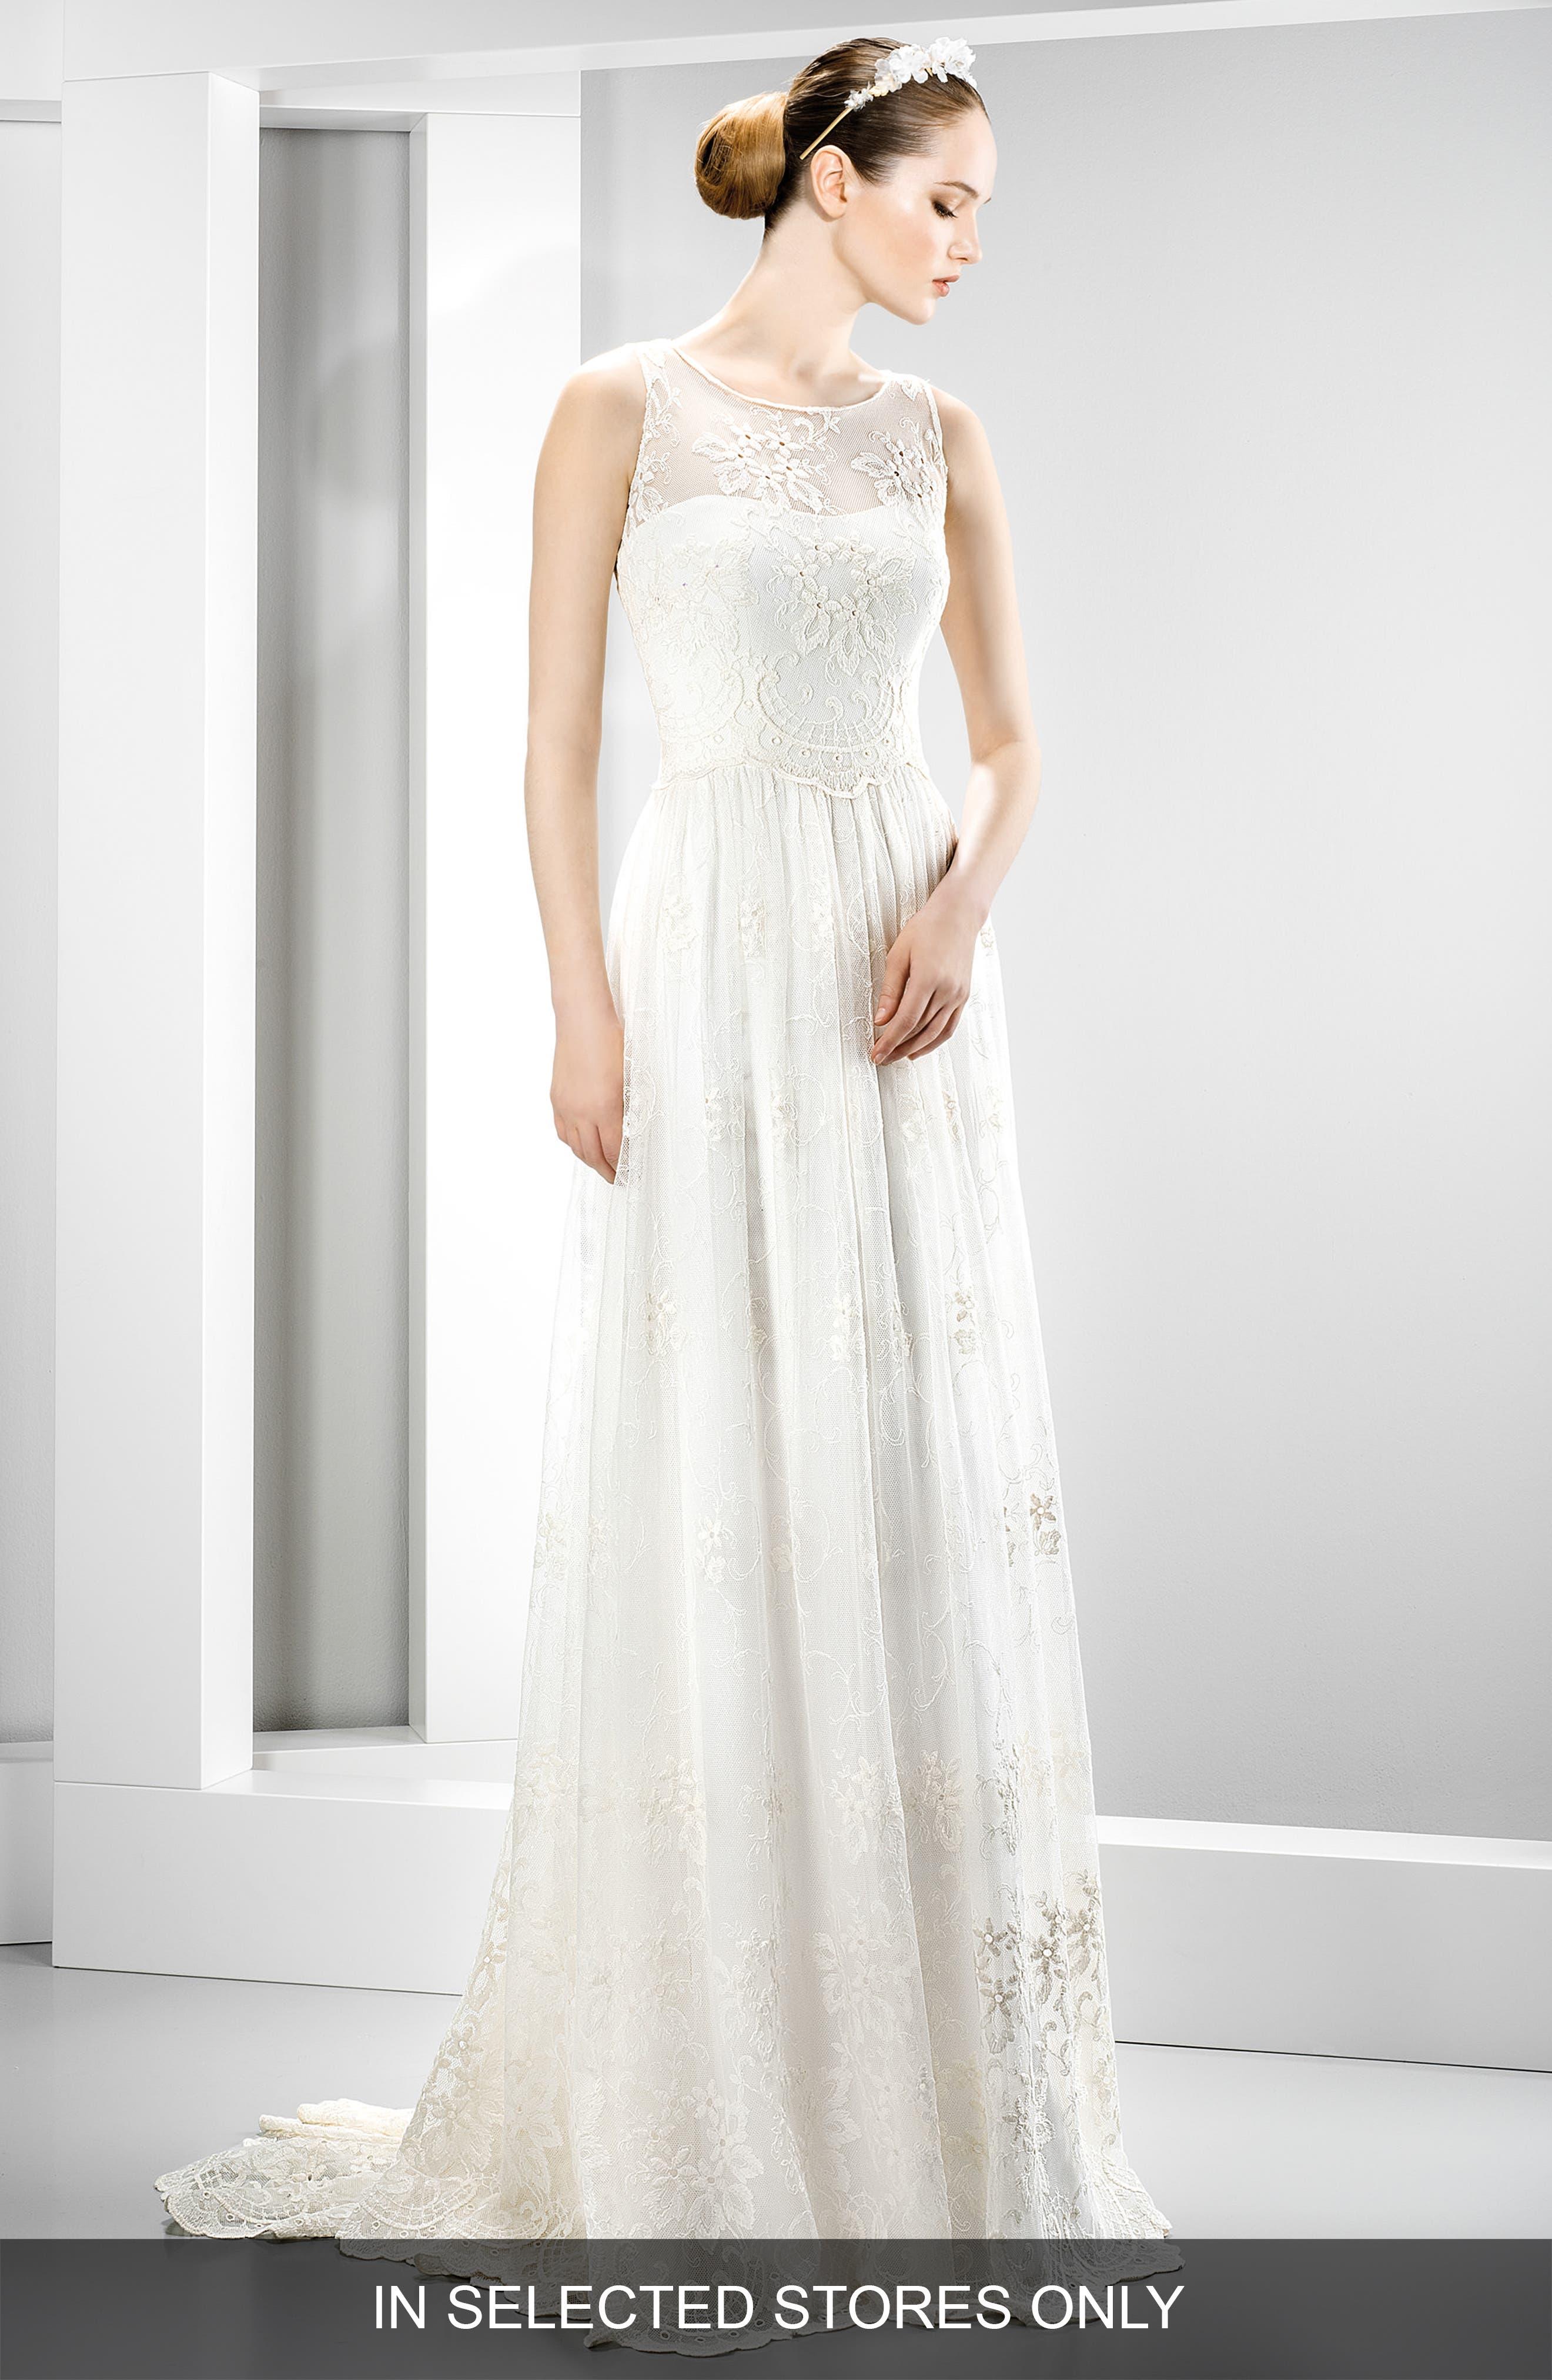 Illusion Lace Boho Dress,                             Main thumbnail 1, color,                             Ivory